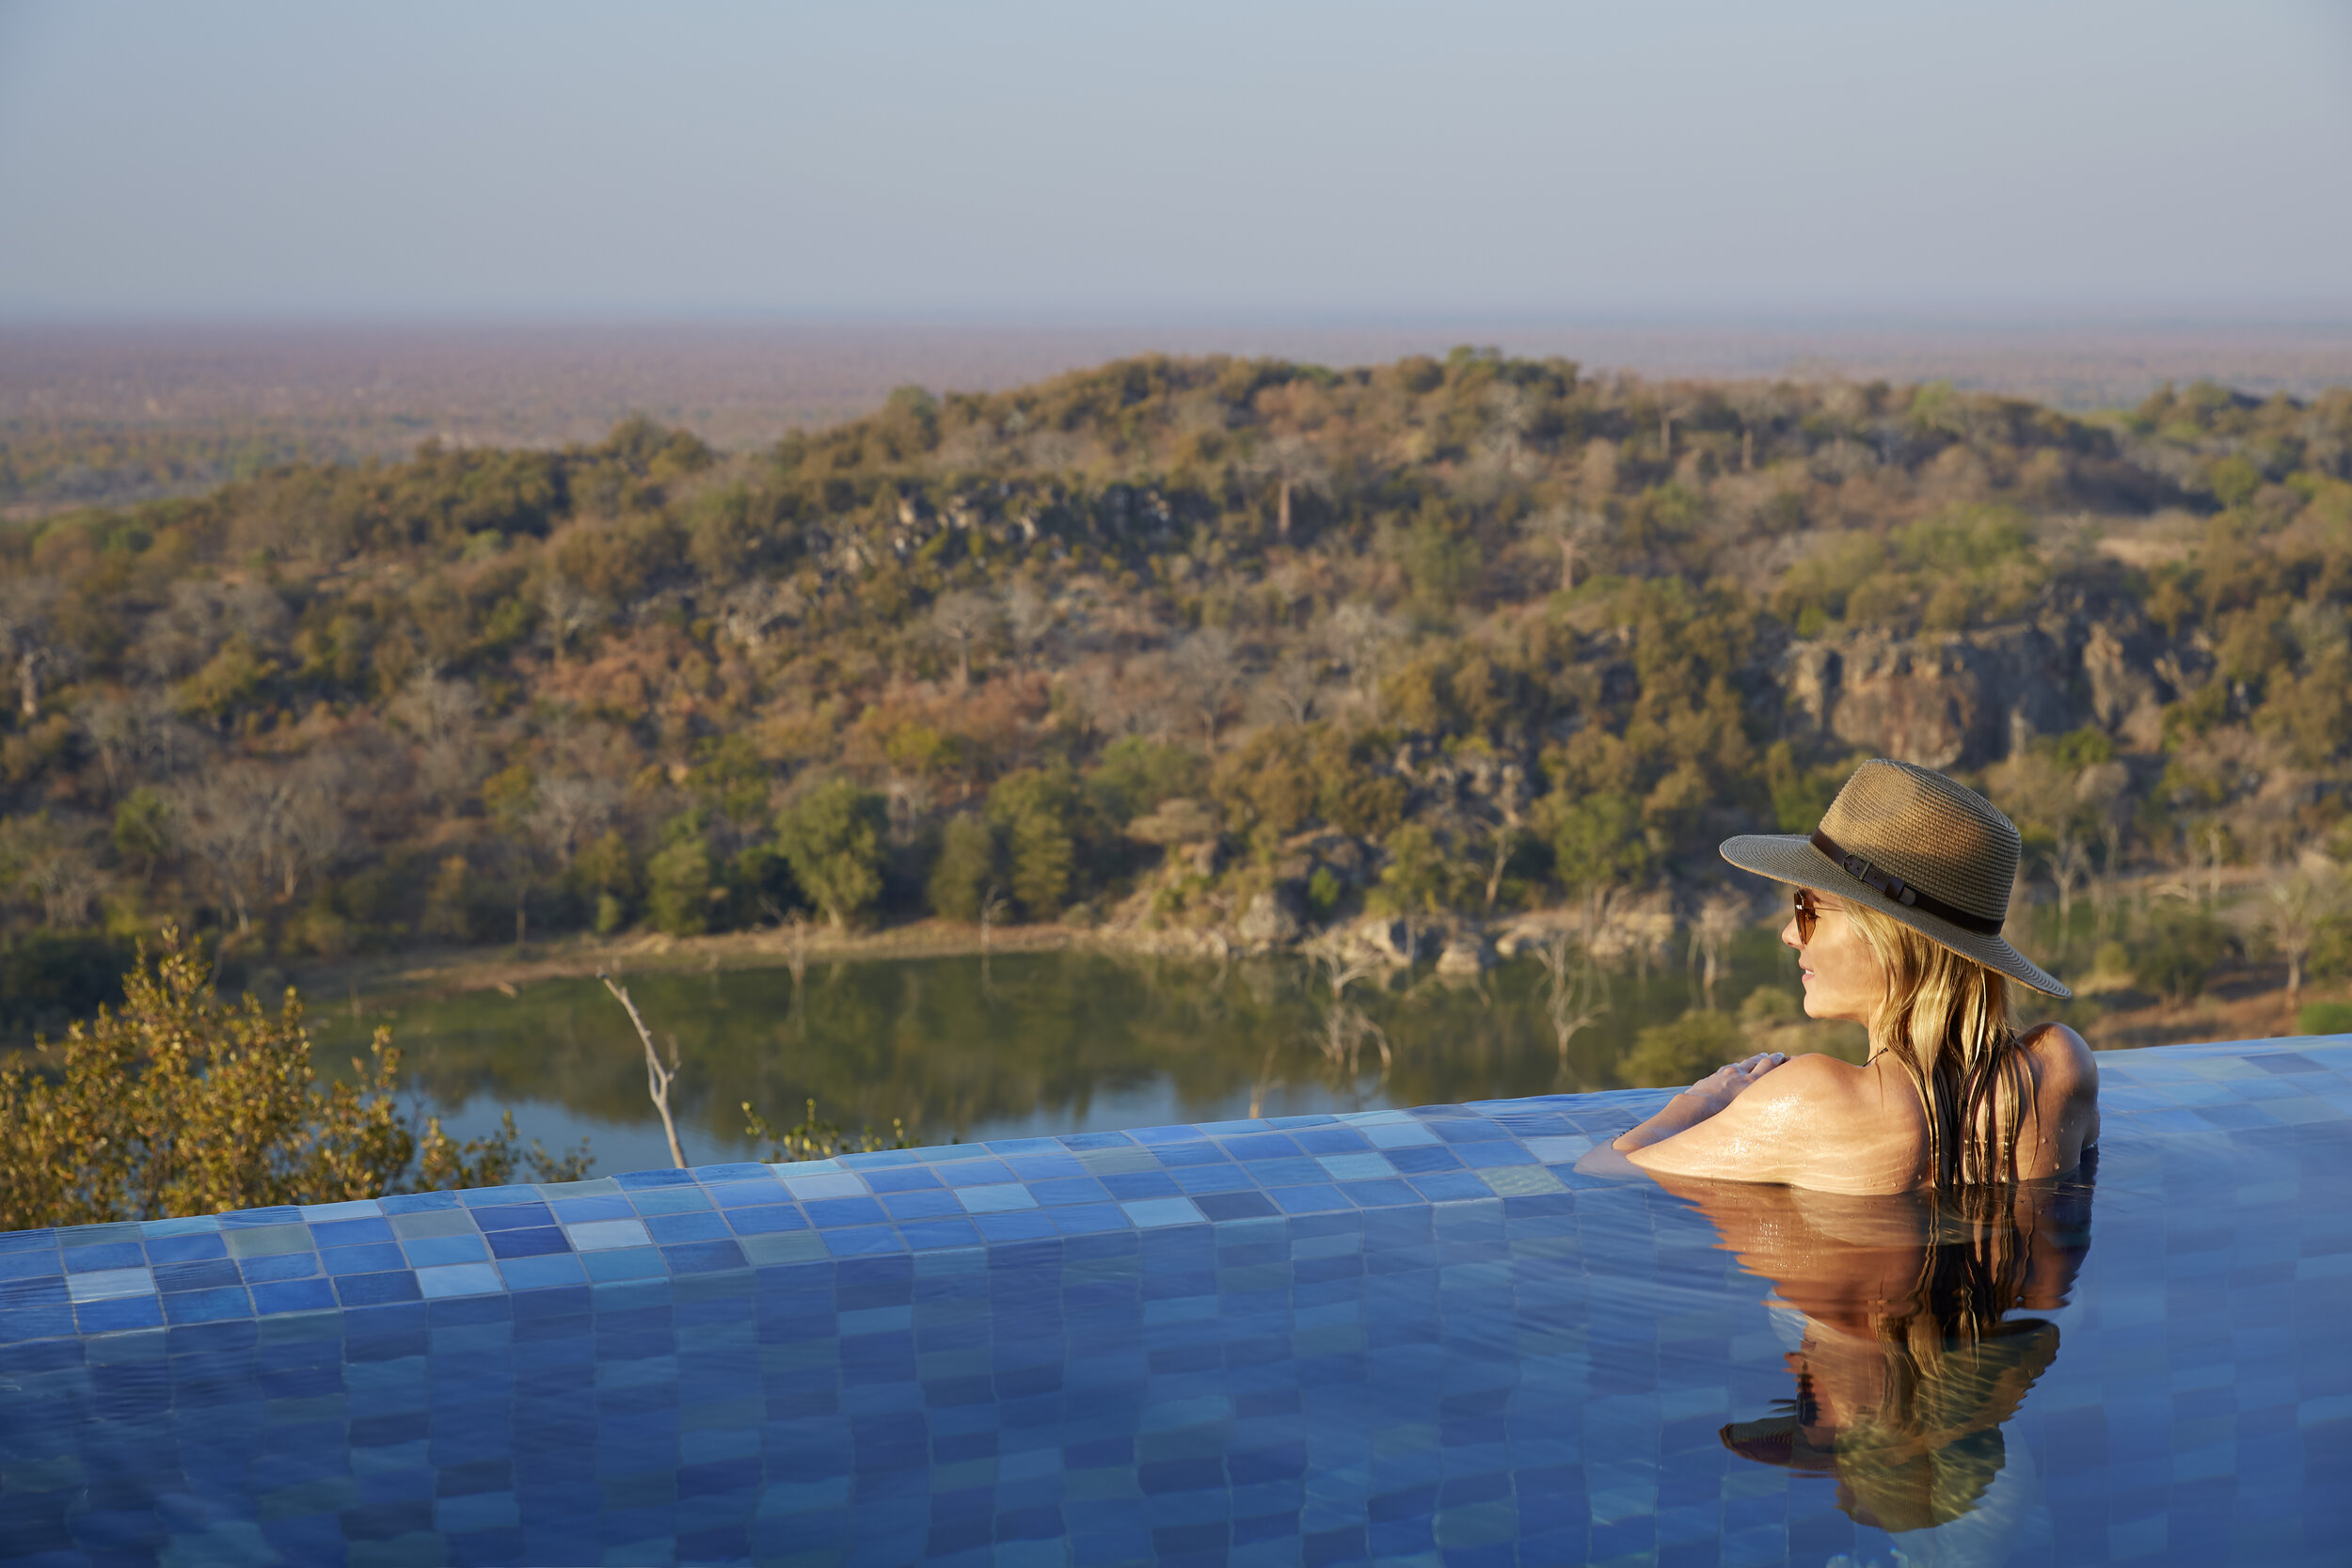 singita_malilangwe_house_-_pool_with_a_view.jpg